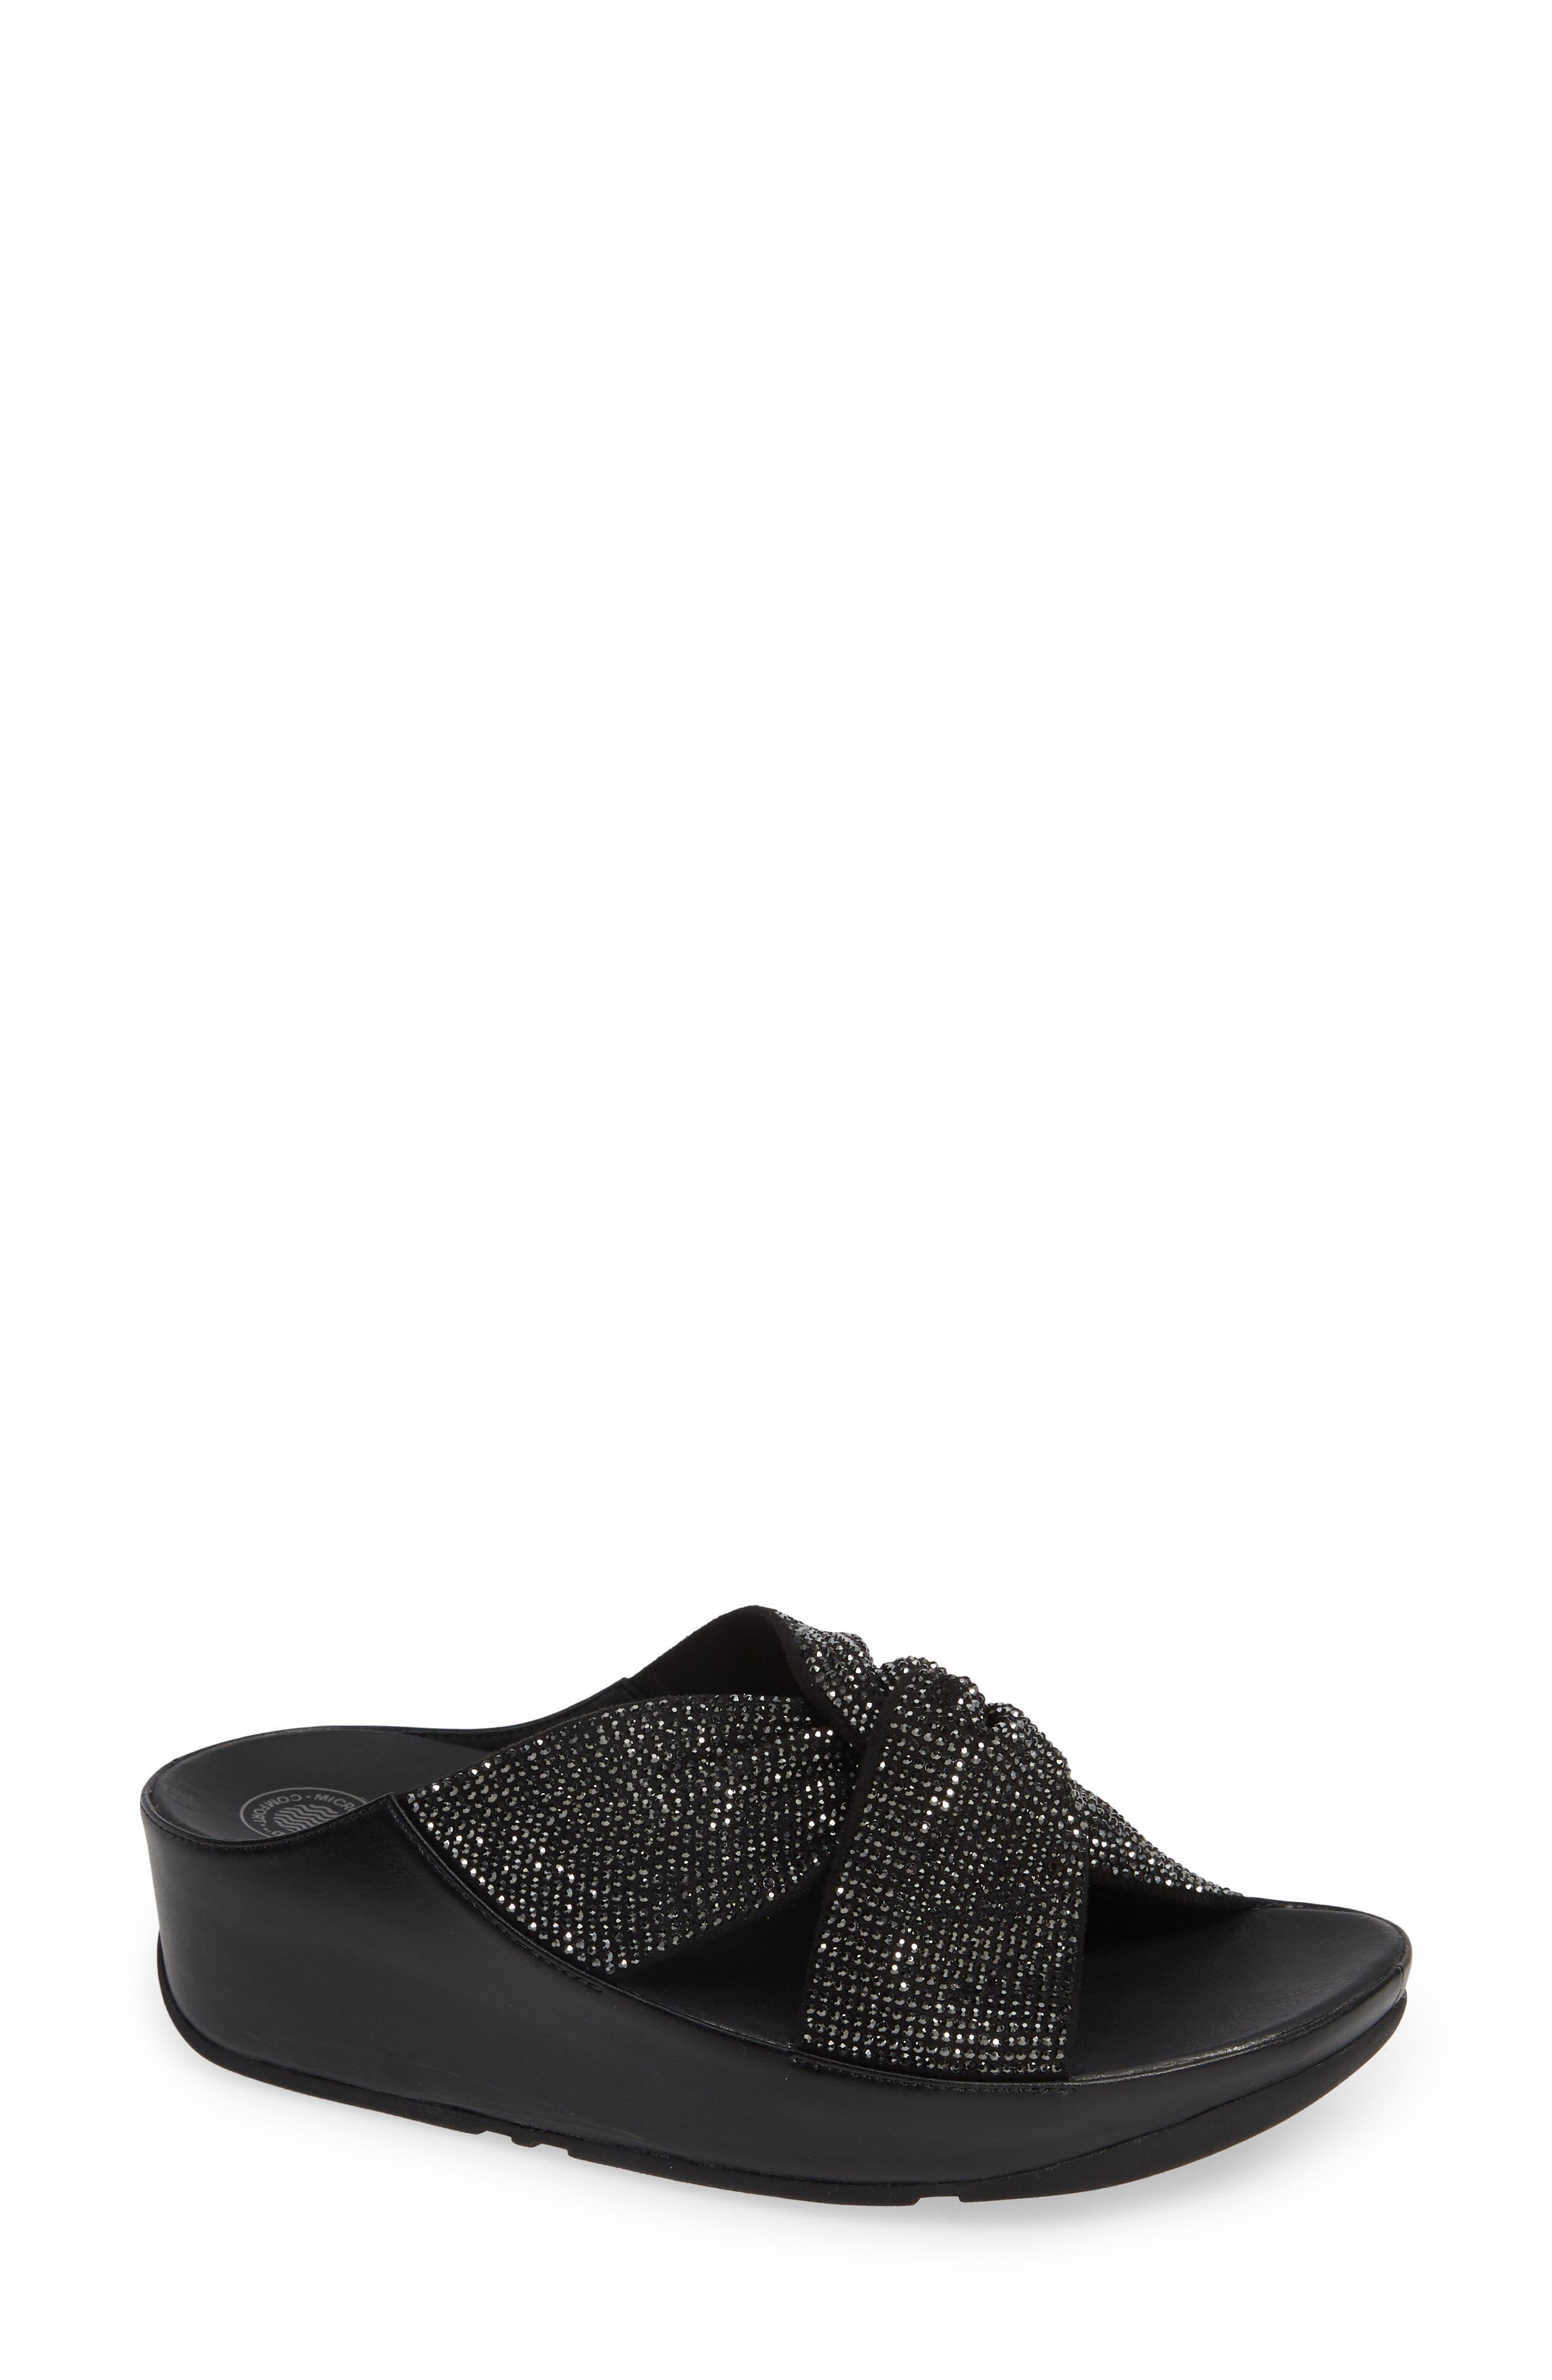 FITFLOP, Twiss Crystal Embellished Slide Sandal, Main thumbnail 1, color, BLACK FABRIC